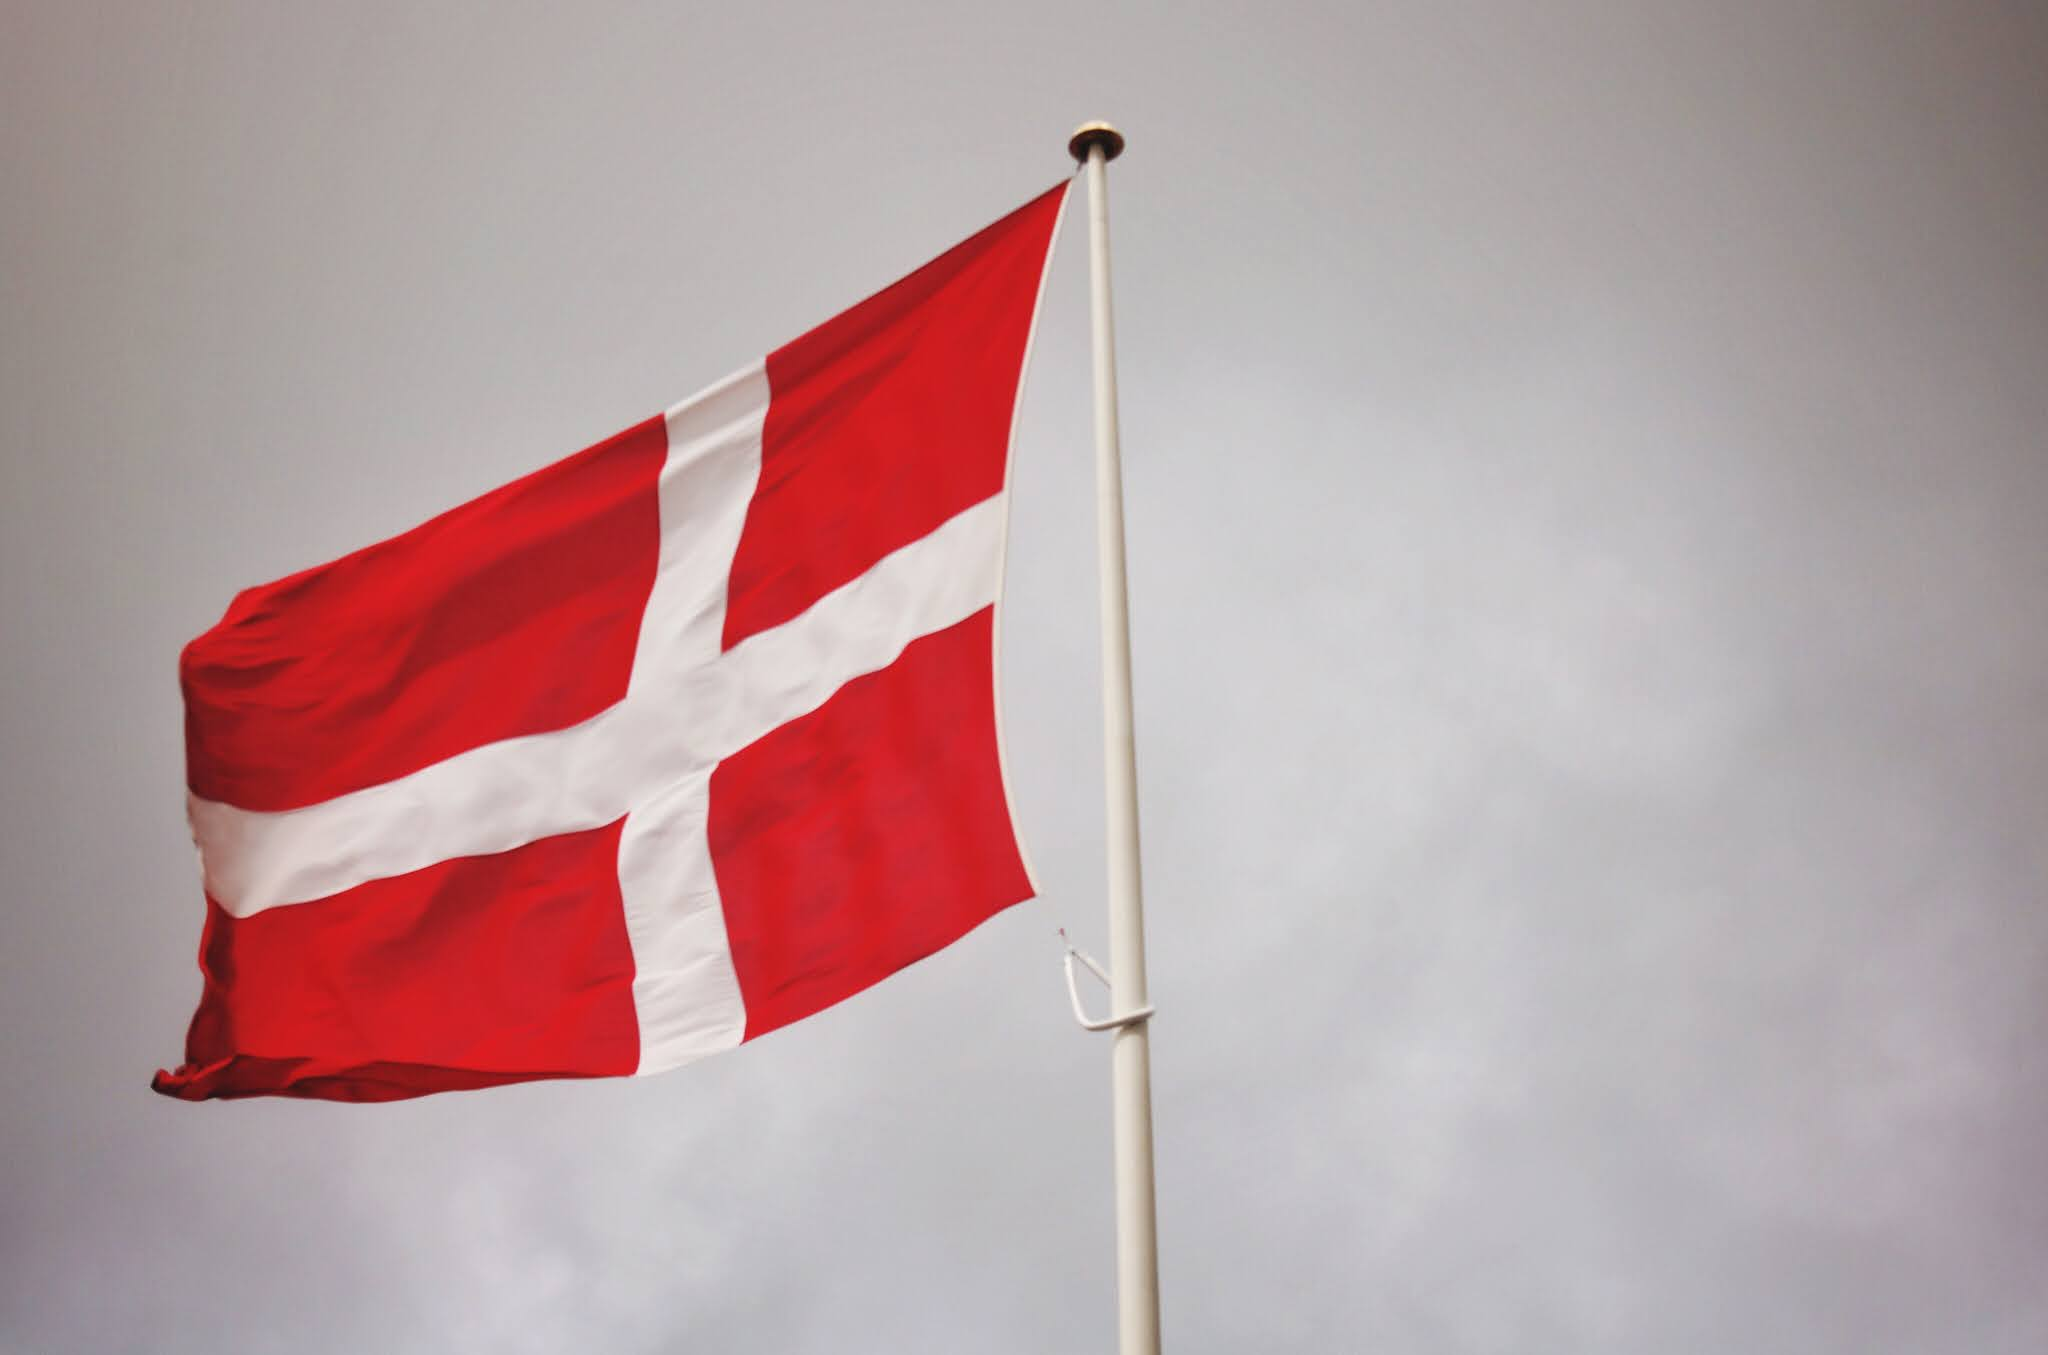 Danish companies like DSV and Maersk to participate at Expo Dubai Danish pavilion